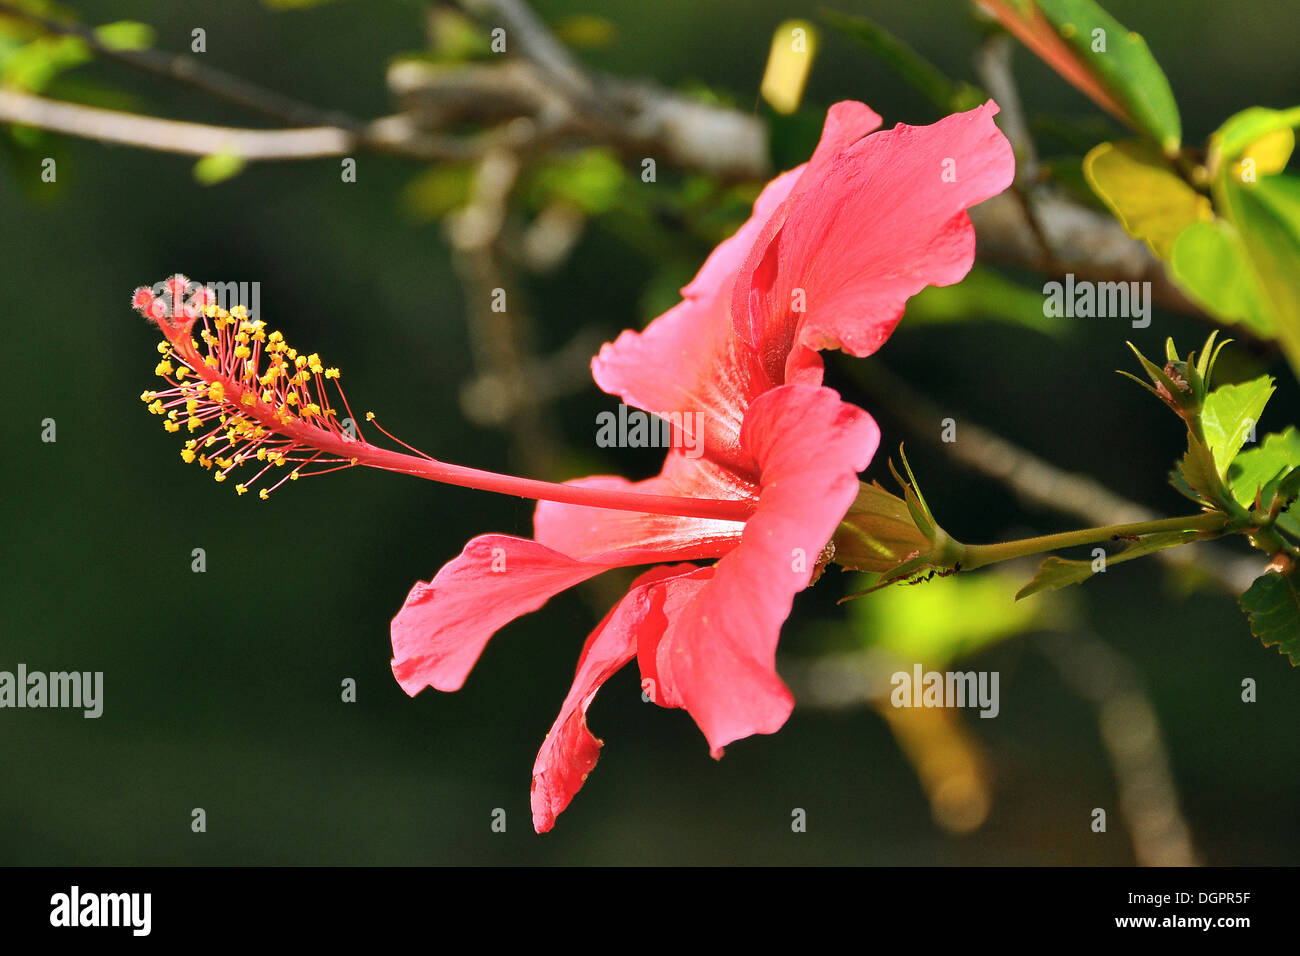 Pink hibiscus (Hibiscus clayi), Chapada Diamantina, Bahia, Brazil, South America Stock Photo